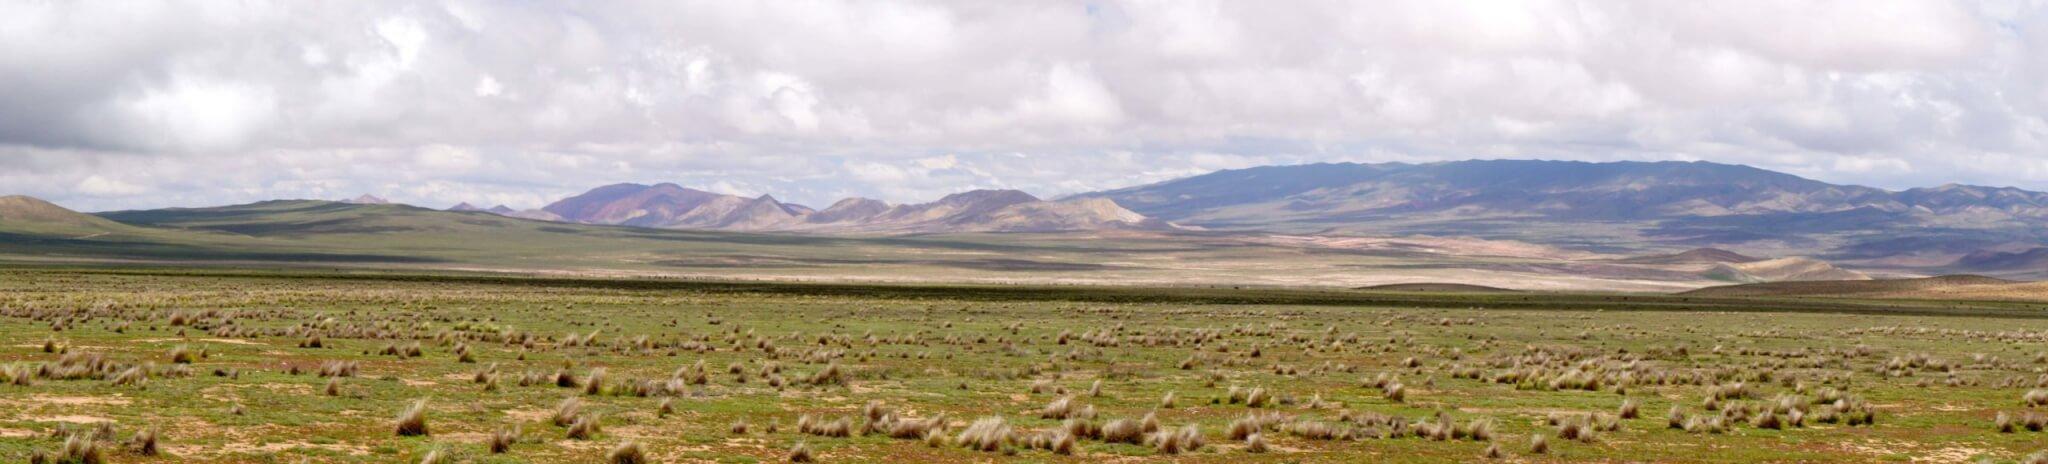 Views of the Altiplano Salta Argentina